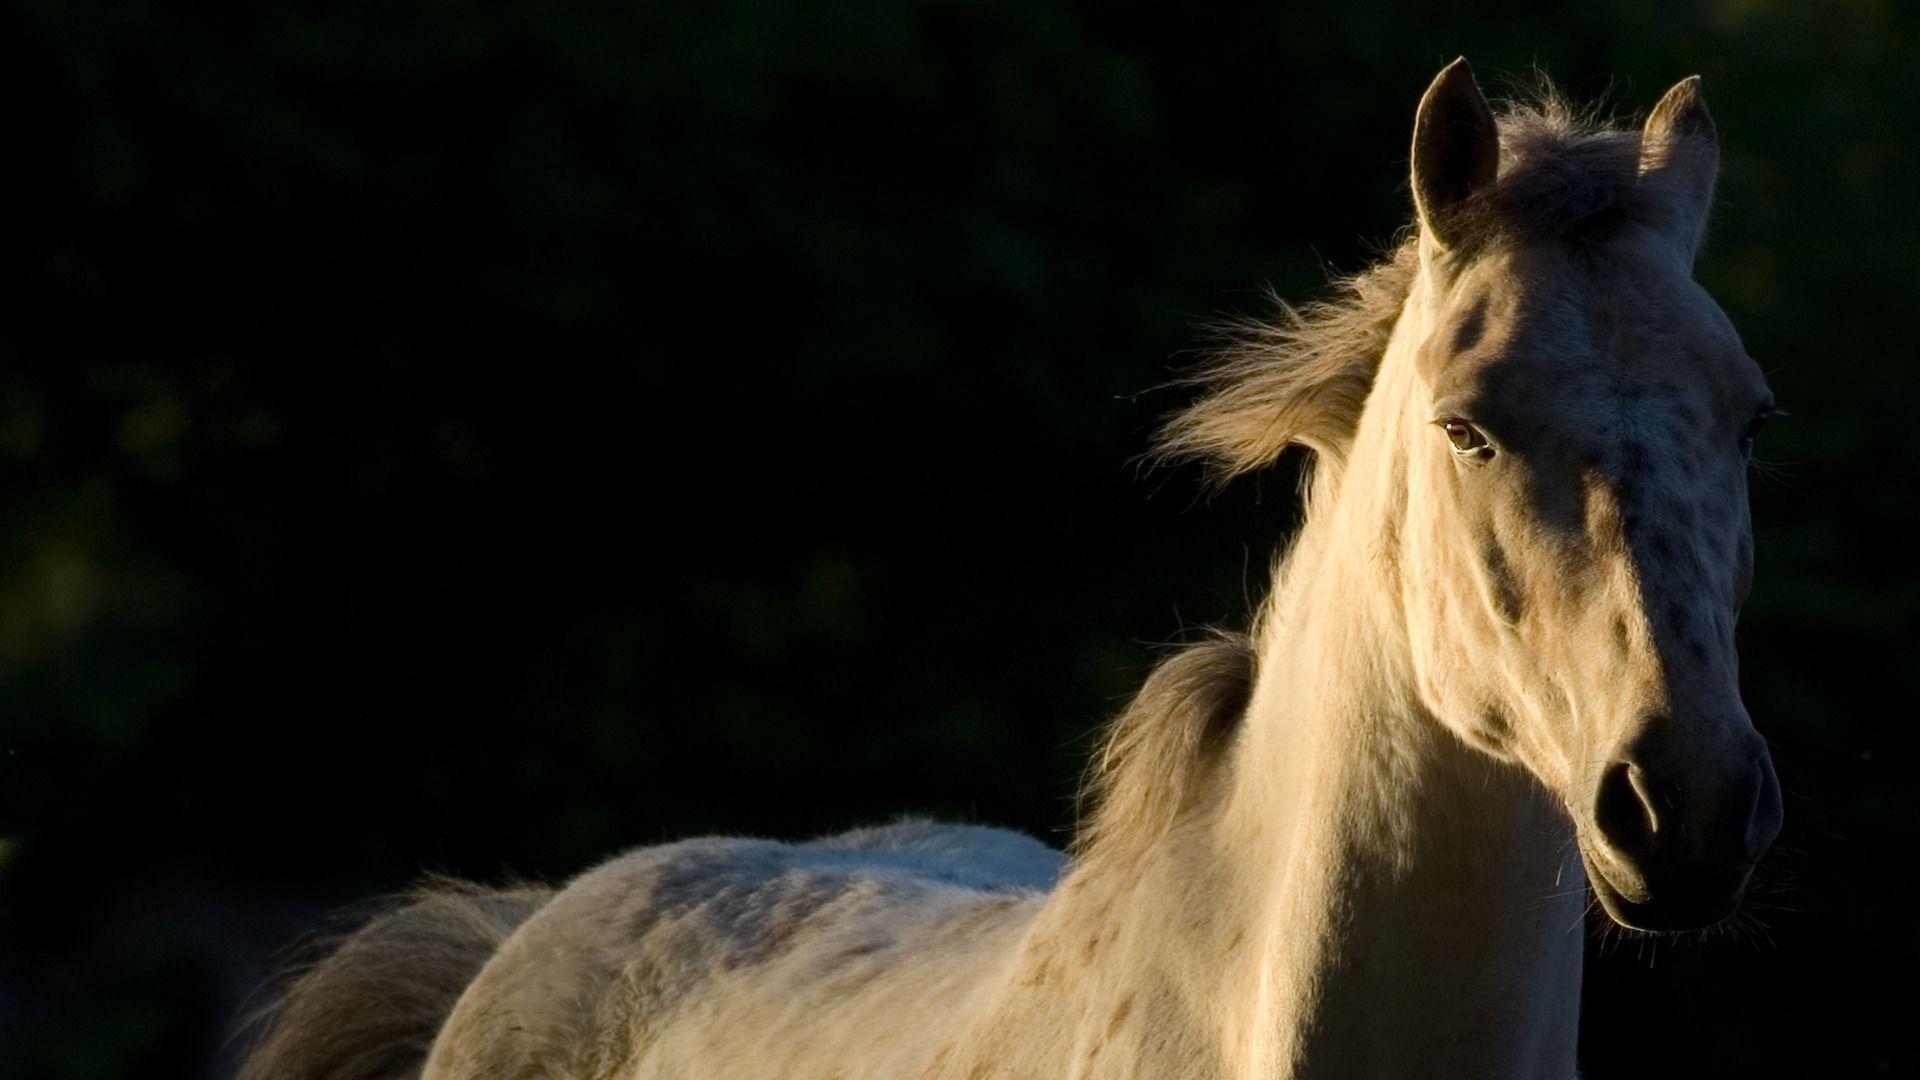 Un caballo blanco (imagen referencial) - Sputnik Mundo, 1920, 25.05.2021